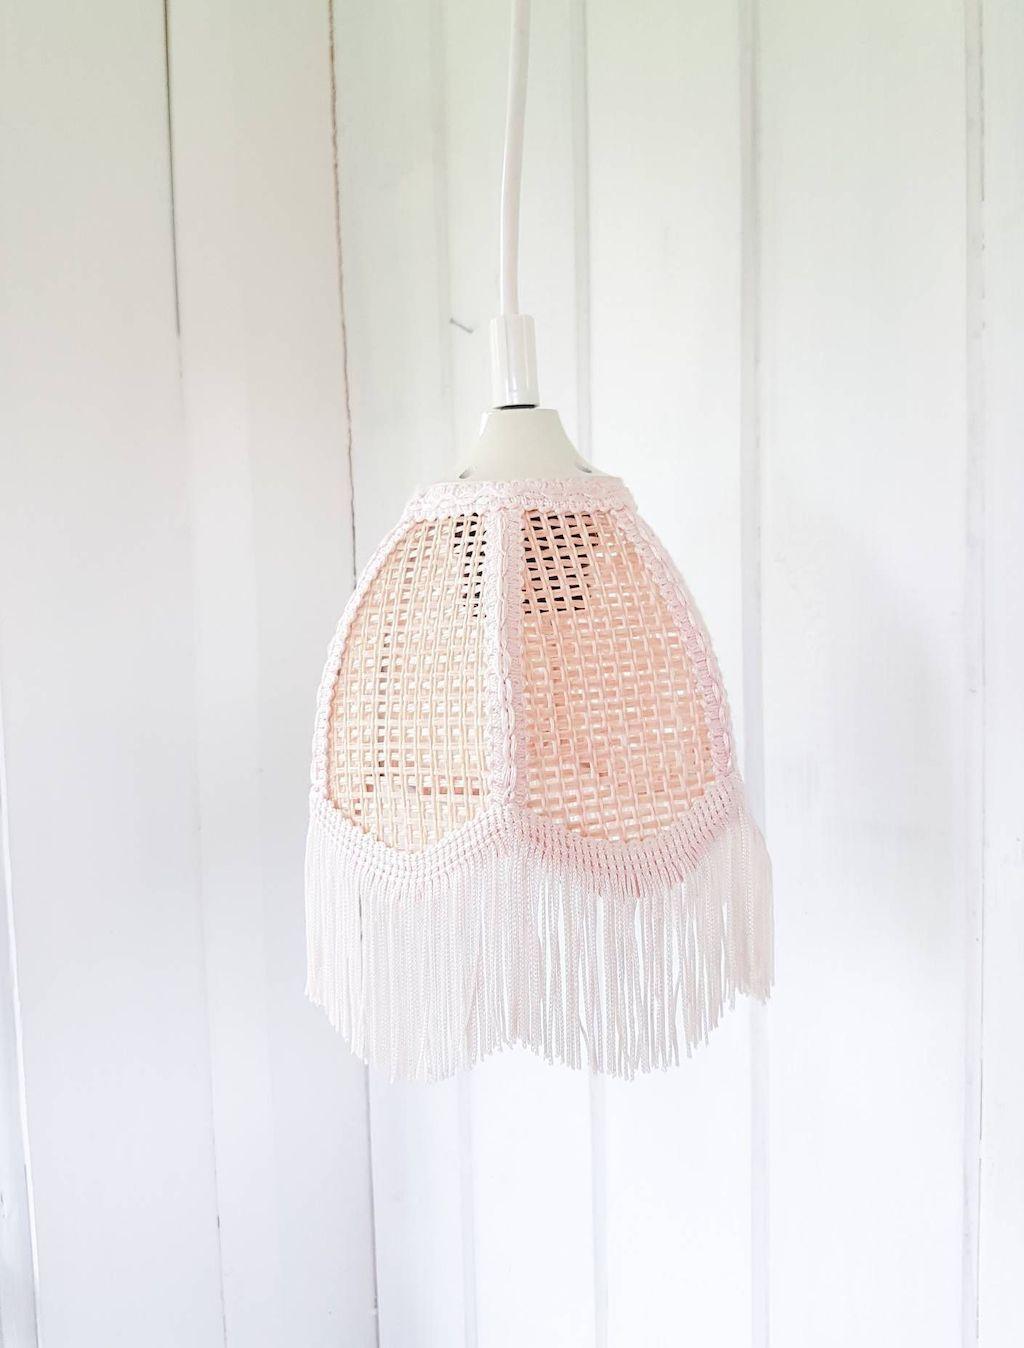 Ceiling Lamp032